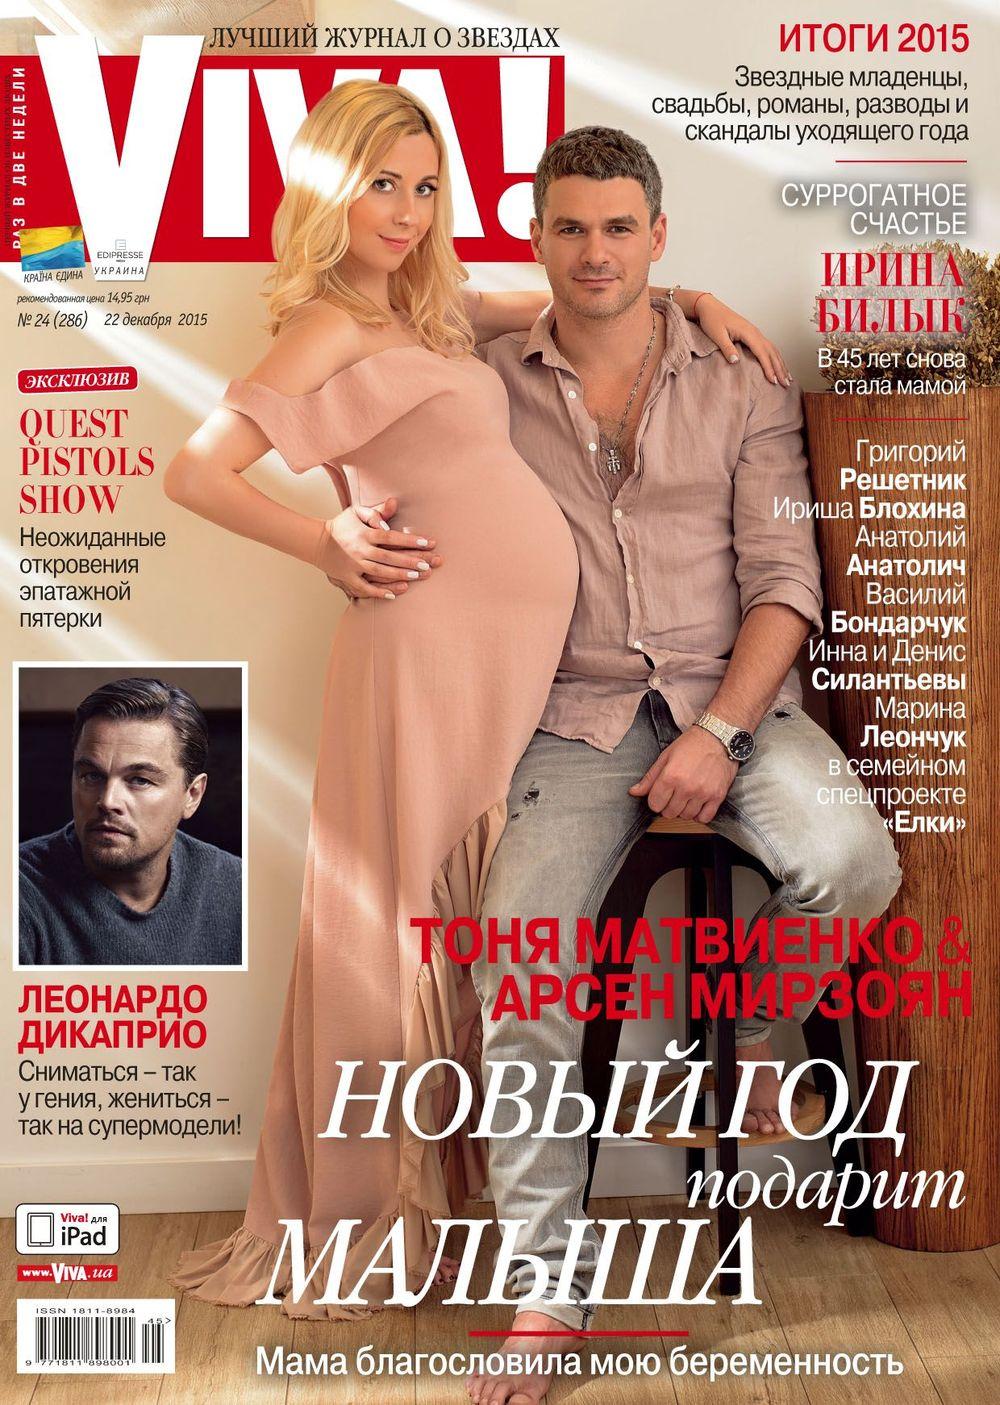 Тоня Матвиенко и Арсен Мирзоян готовятся к рождению ребенка